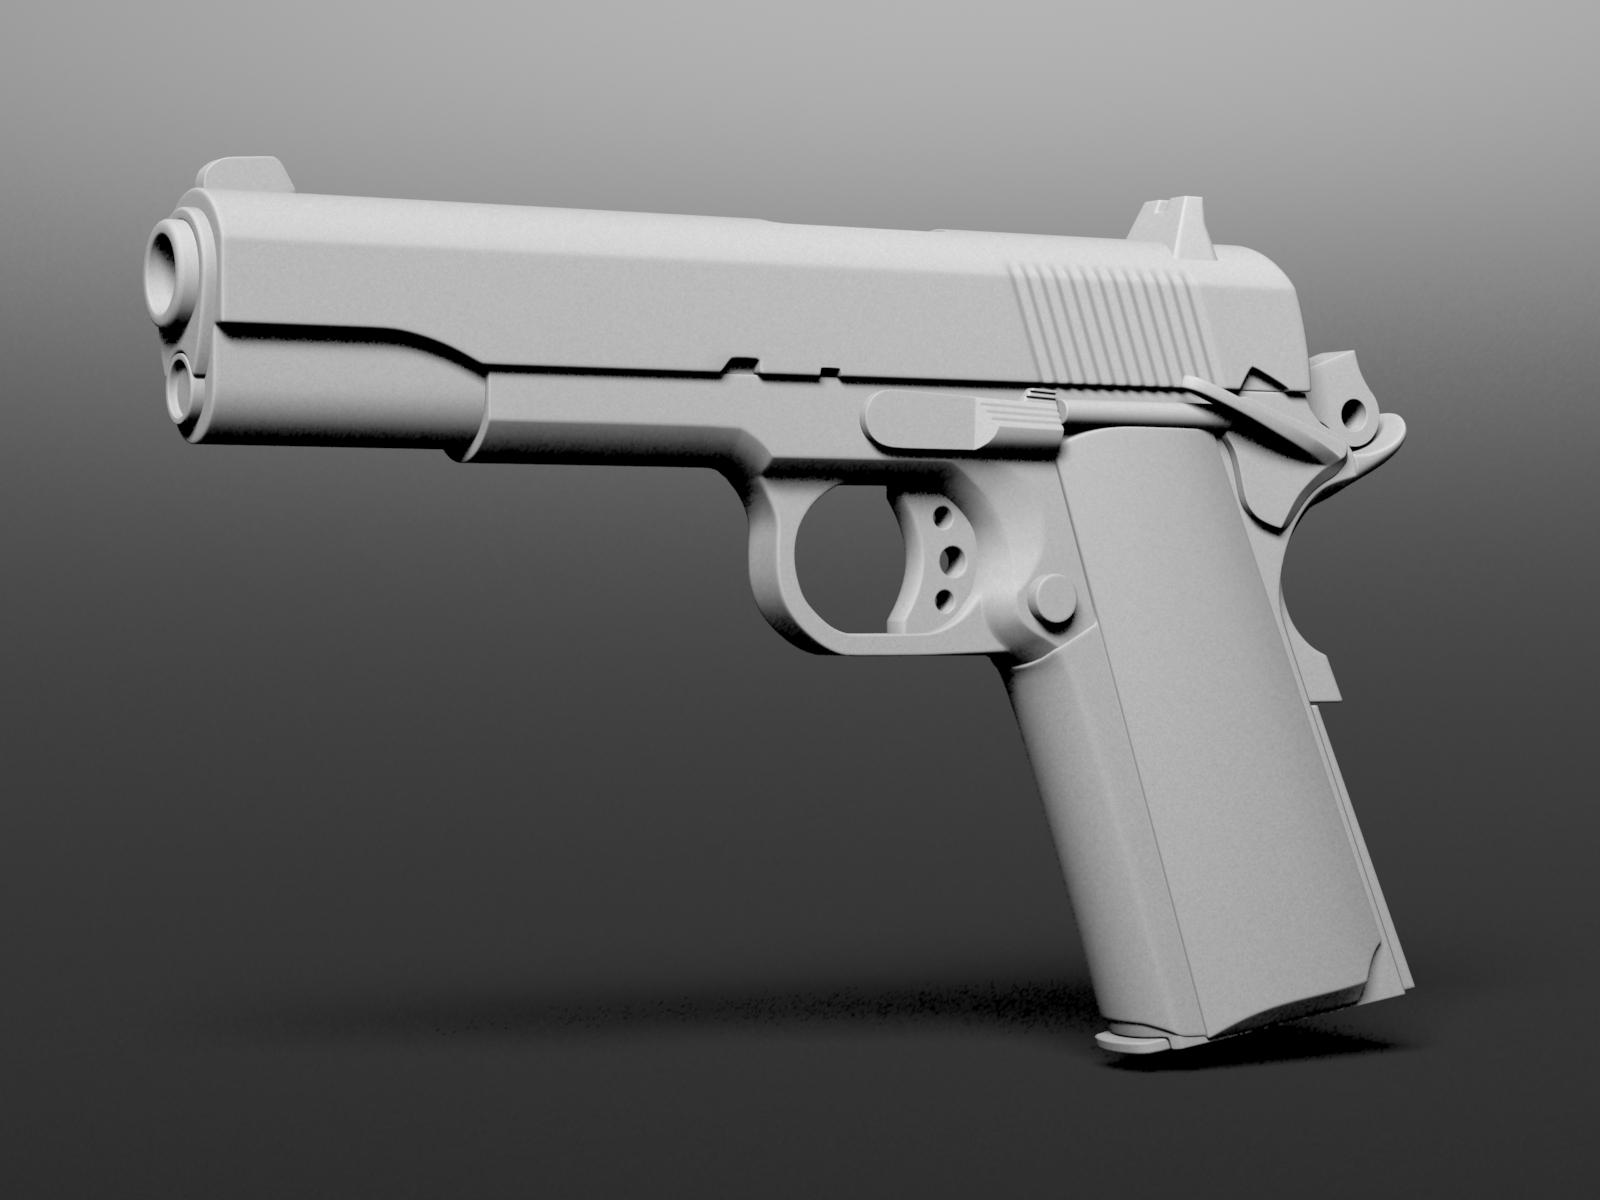 M1911 free 3d model max Free 3d